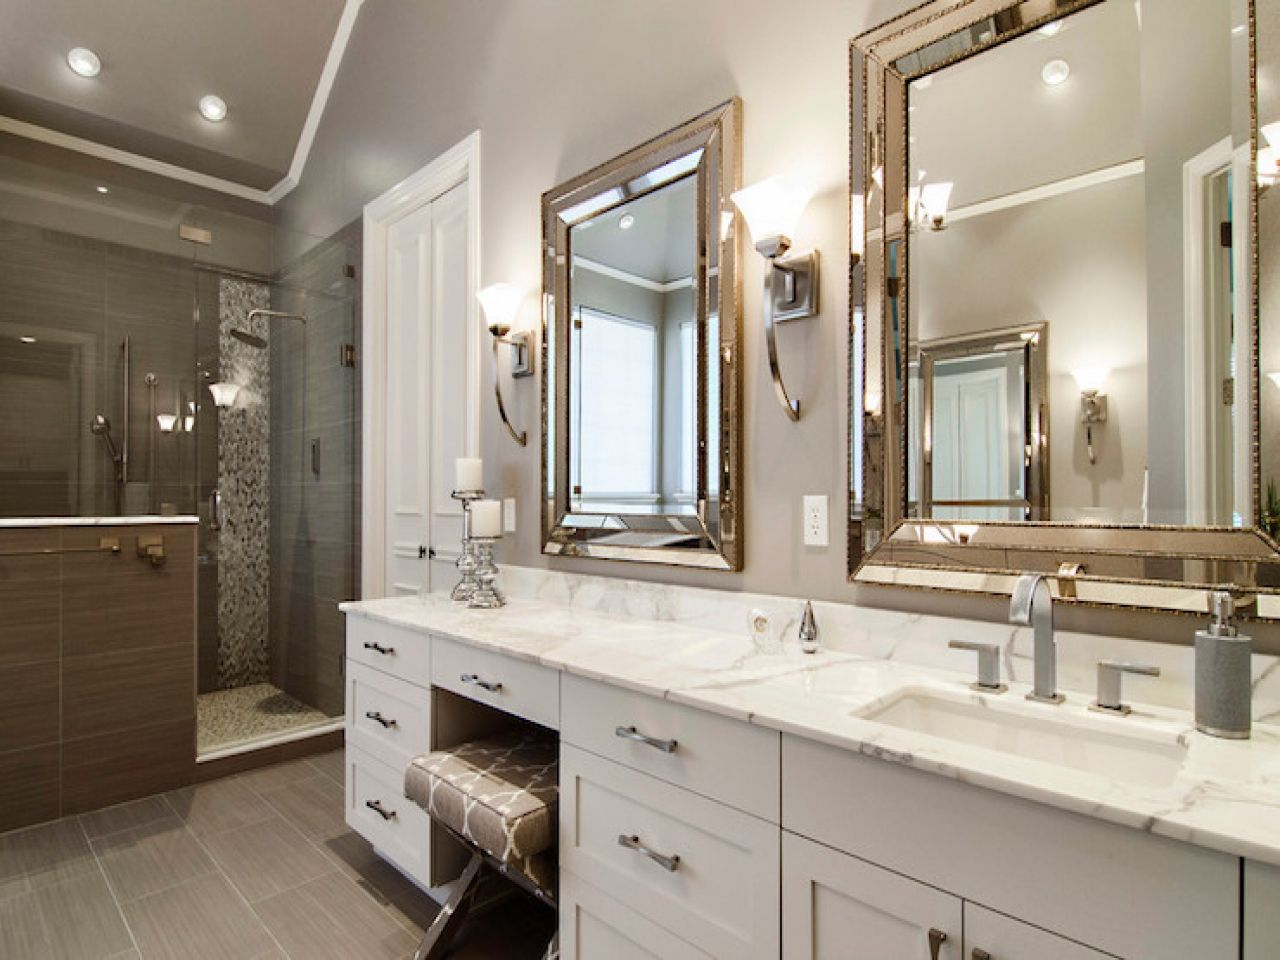 15 Extraordinary Transitional Bathroom Designs For Any Home Farmhouse Master Bathroom Bathroom Remodel Master Transitional Bathroom Design